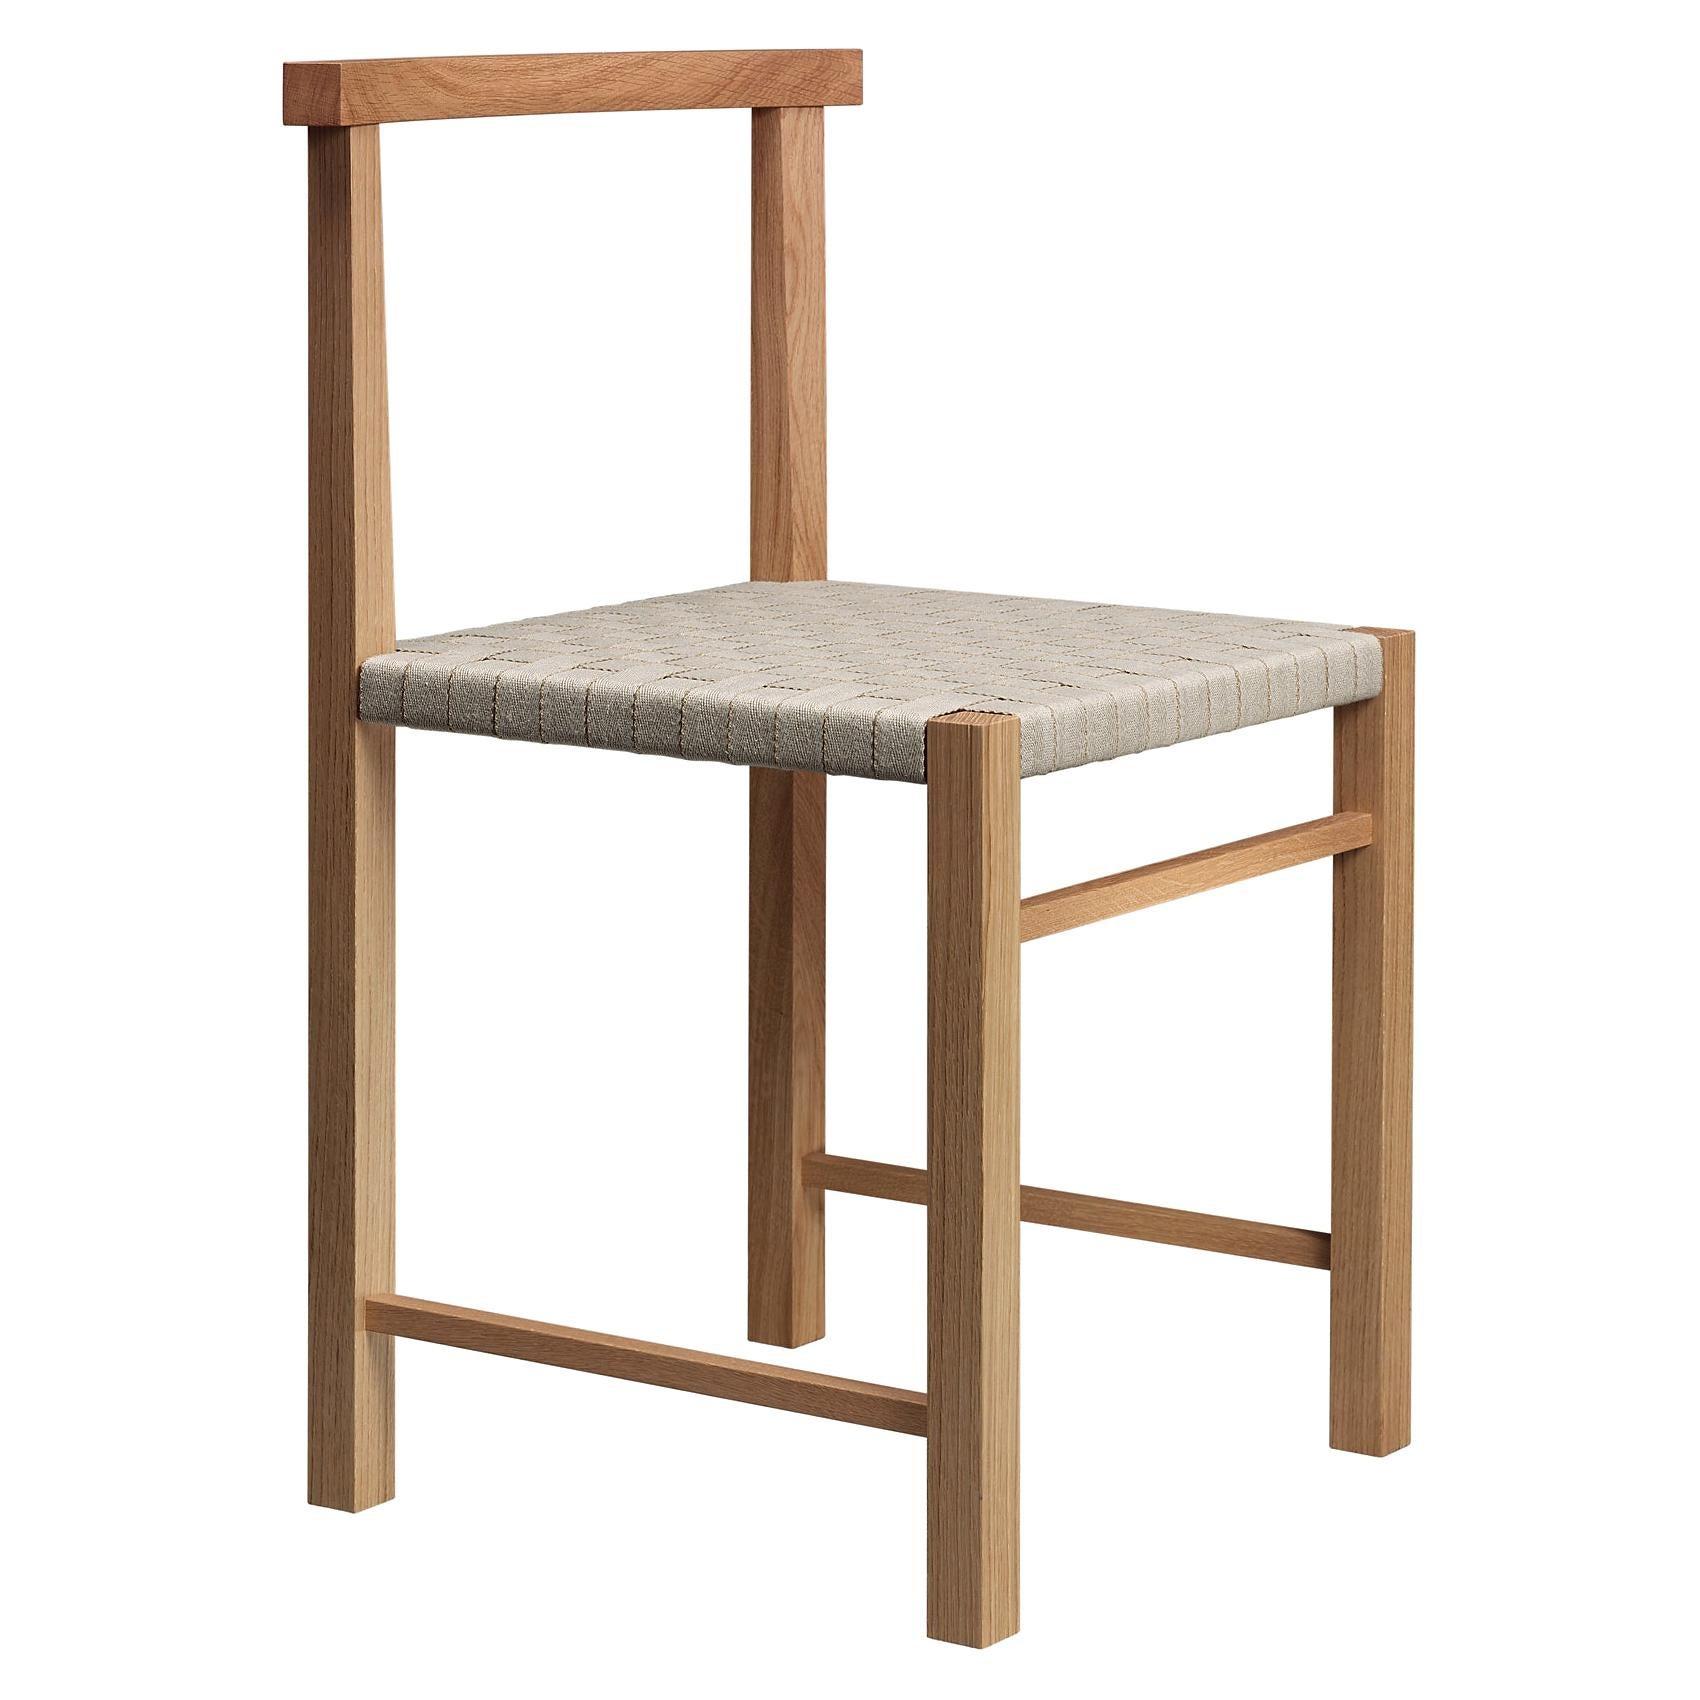 e15 Karnak Chair with European Oak Base by Ferdinand Kramer